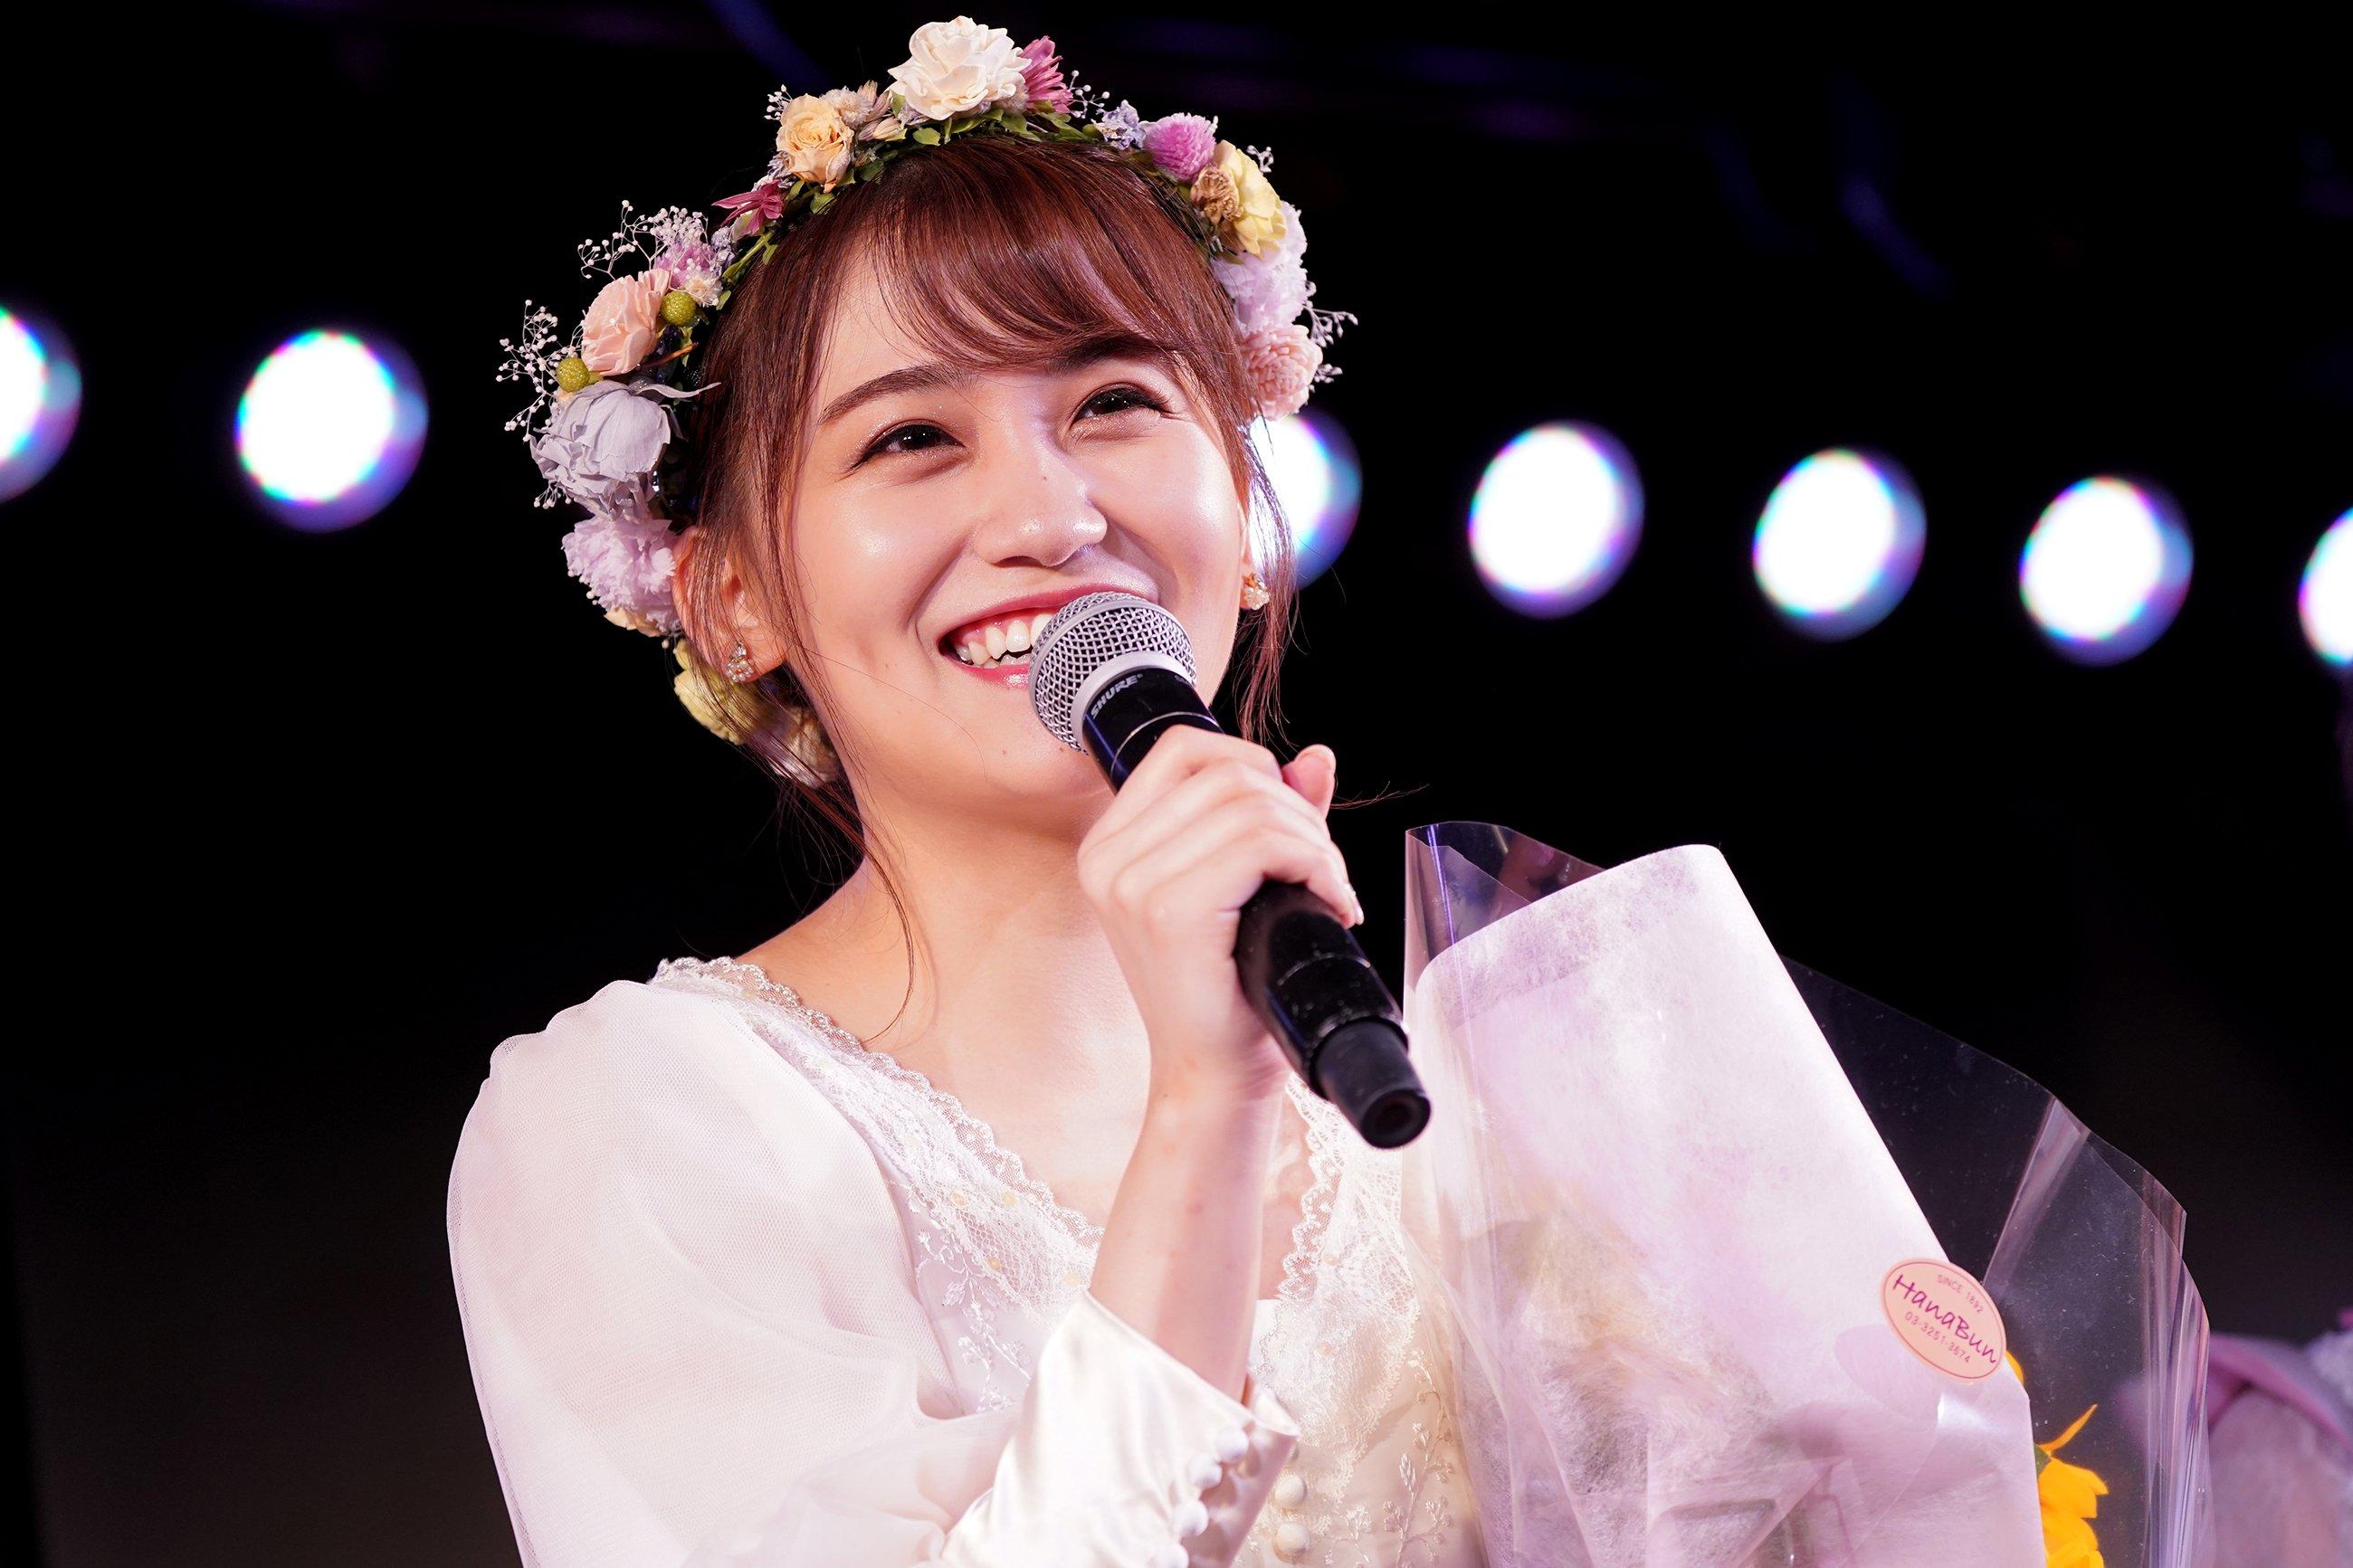 AKB48小嶋真子「みんなの笑顔が私のエネルギー」笑顔で卒業【写真10枚】の画像009